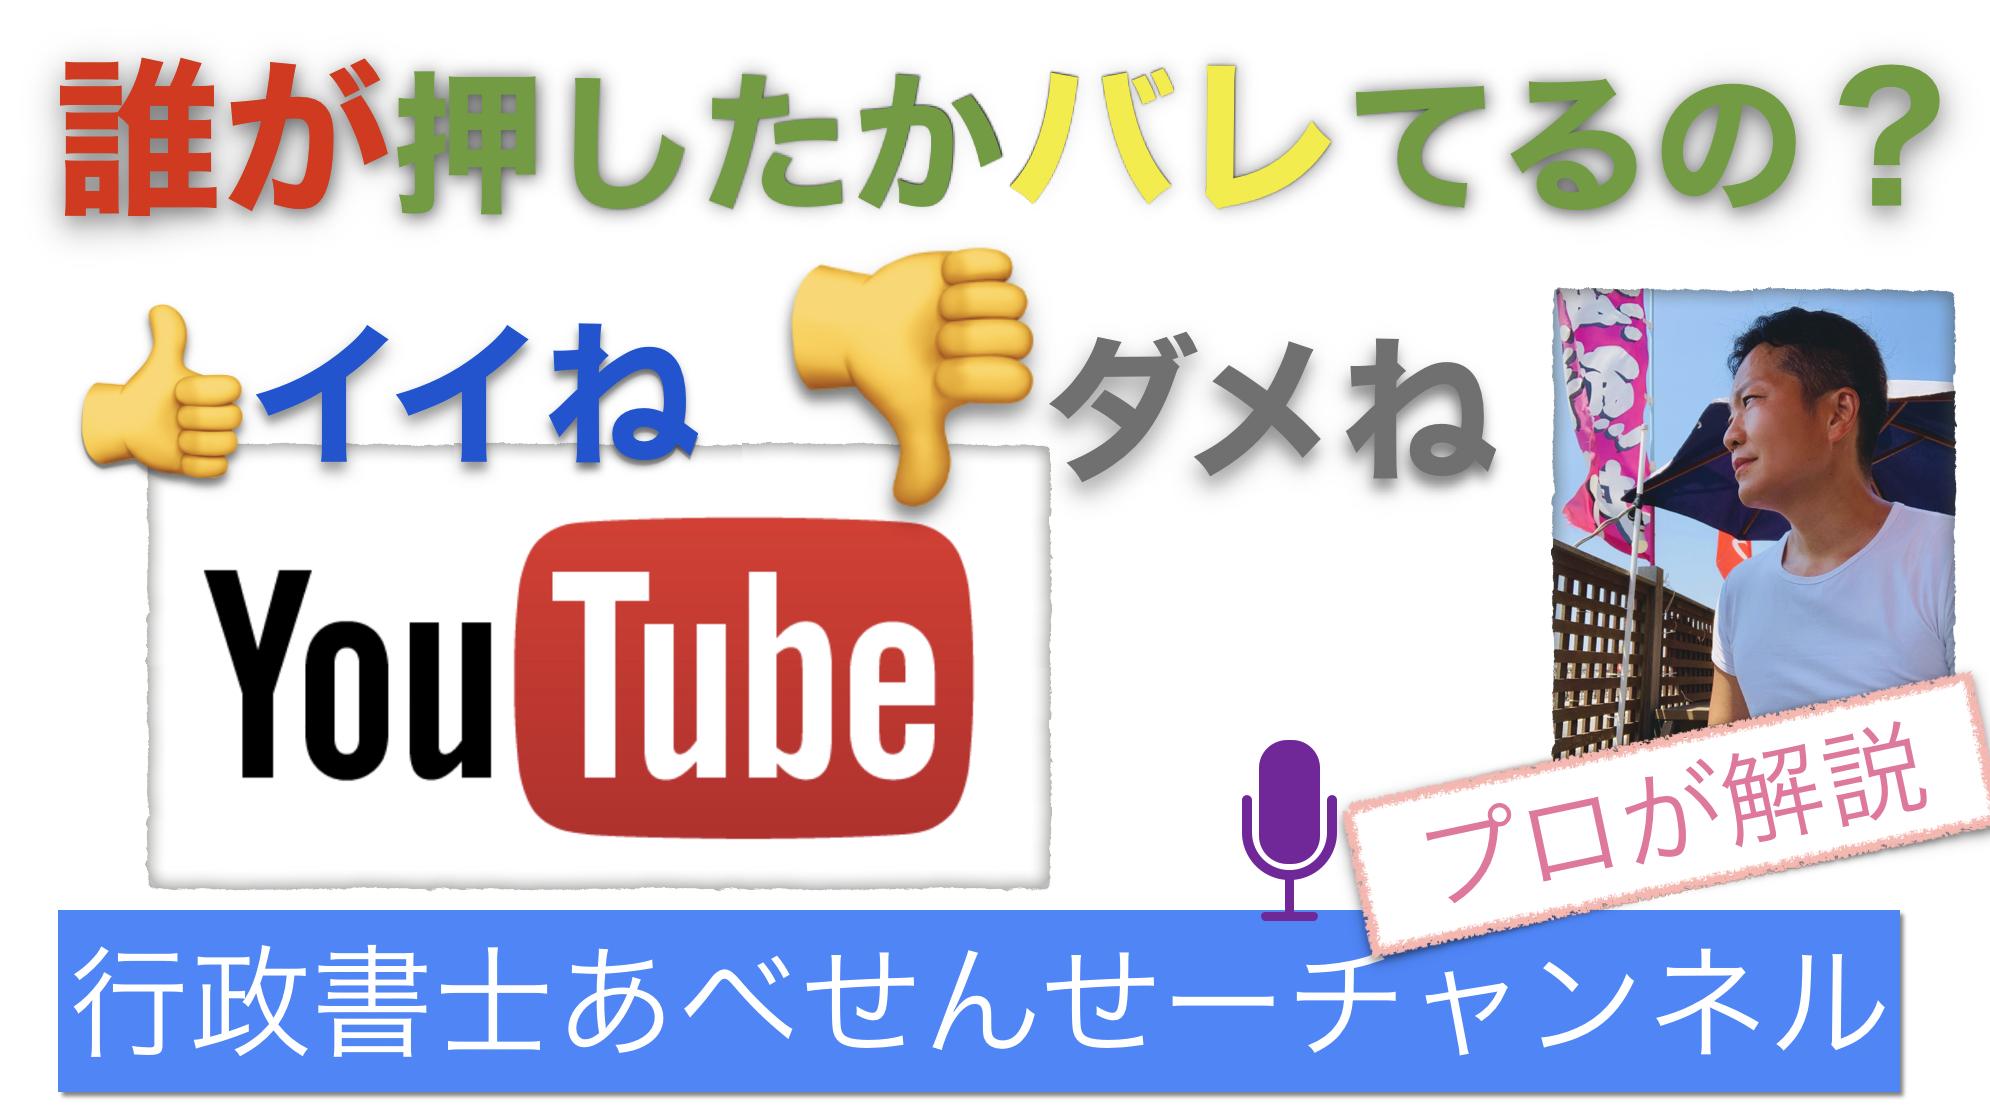 YouTubeのイイねボタン、バッドボタン、誰が押したのかバレてる?!|行政書士阿部総合事務所